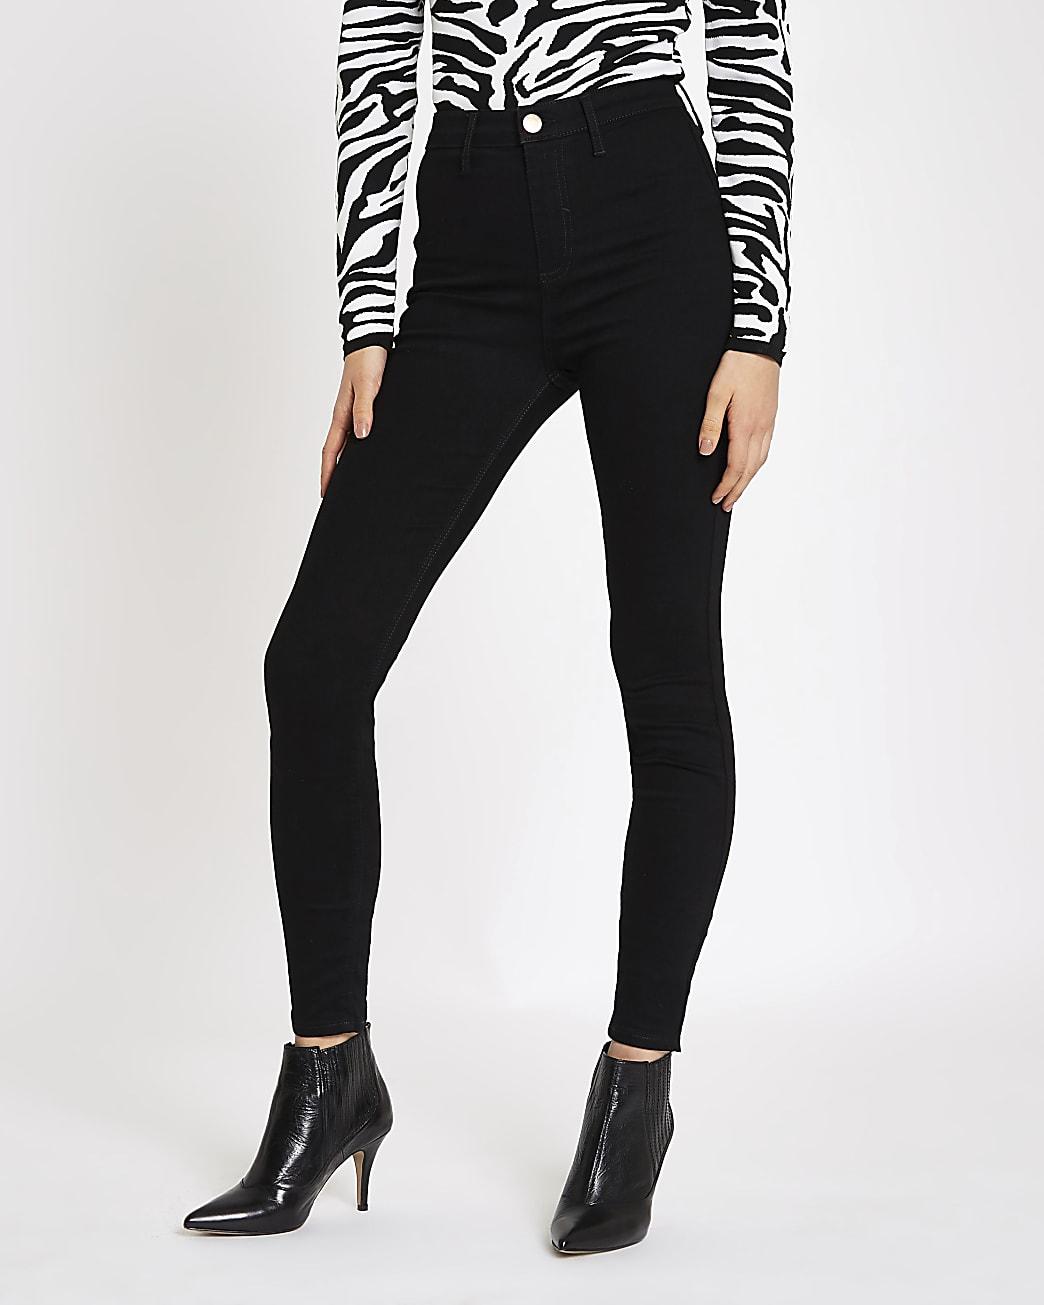 Black high waisted skinny jeans